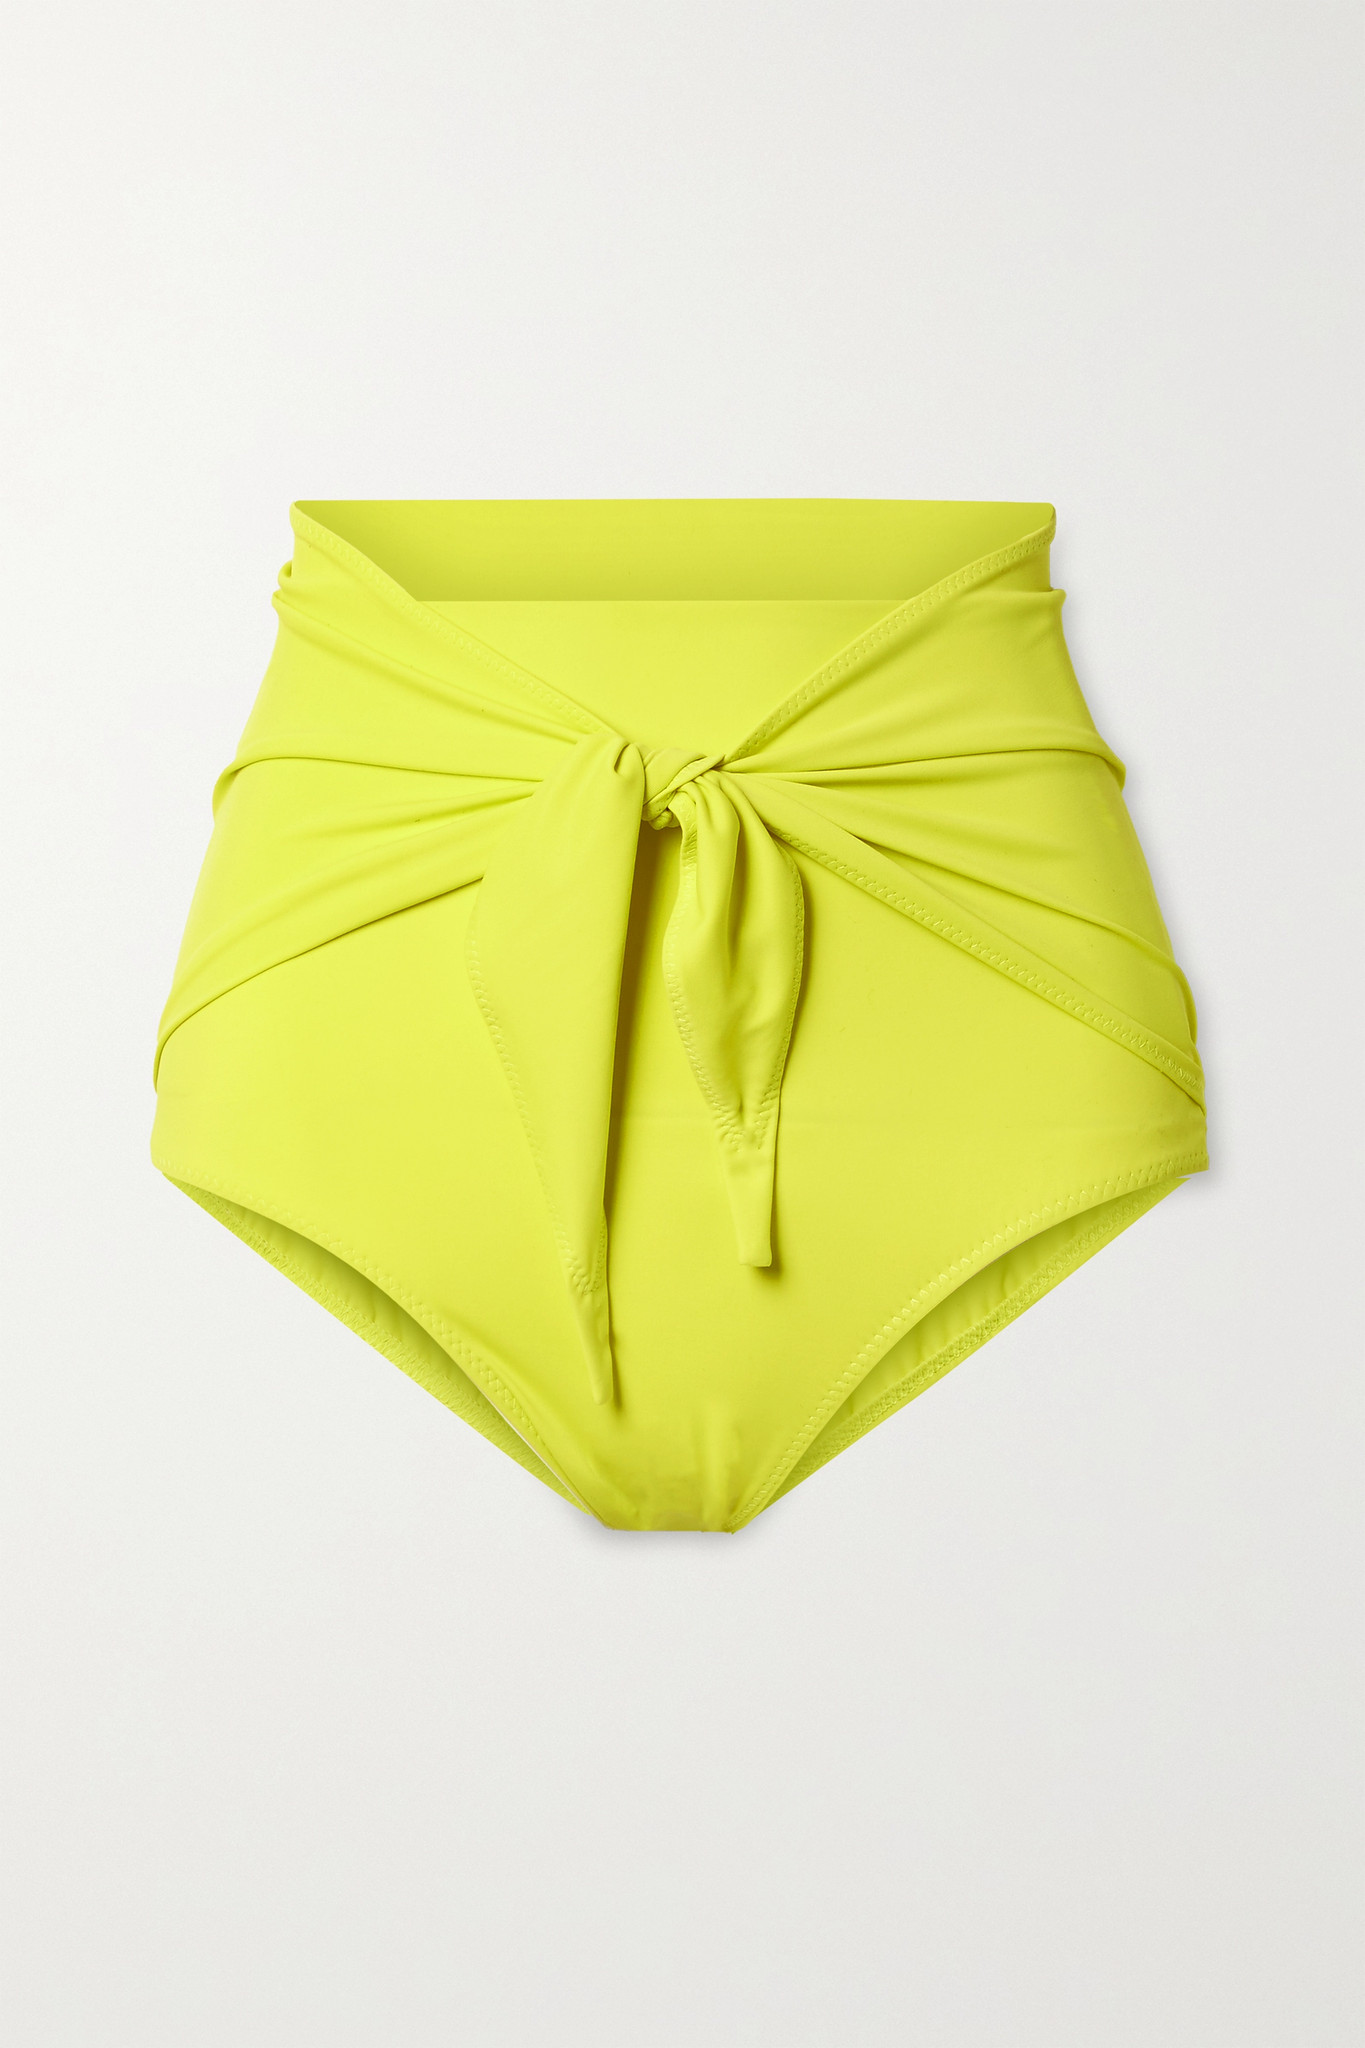 NORMA KAMALI - 正面系带比基尼三角裤 - 黄色 - x small